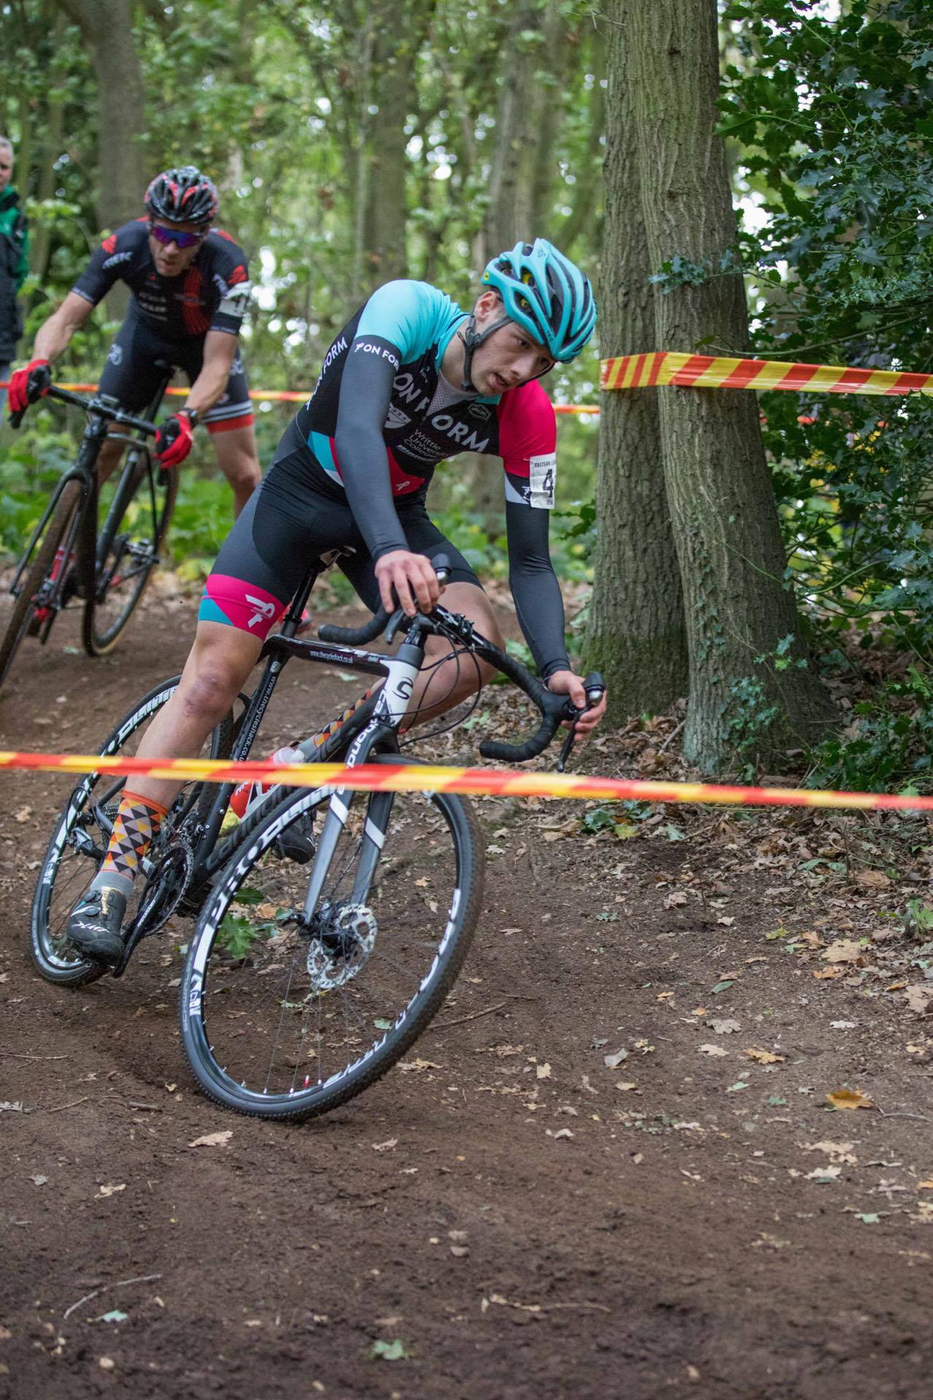 Mistley cyclocross